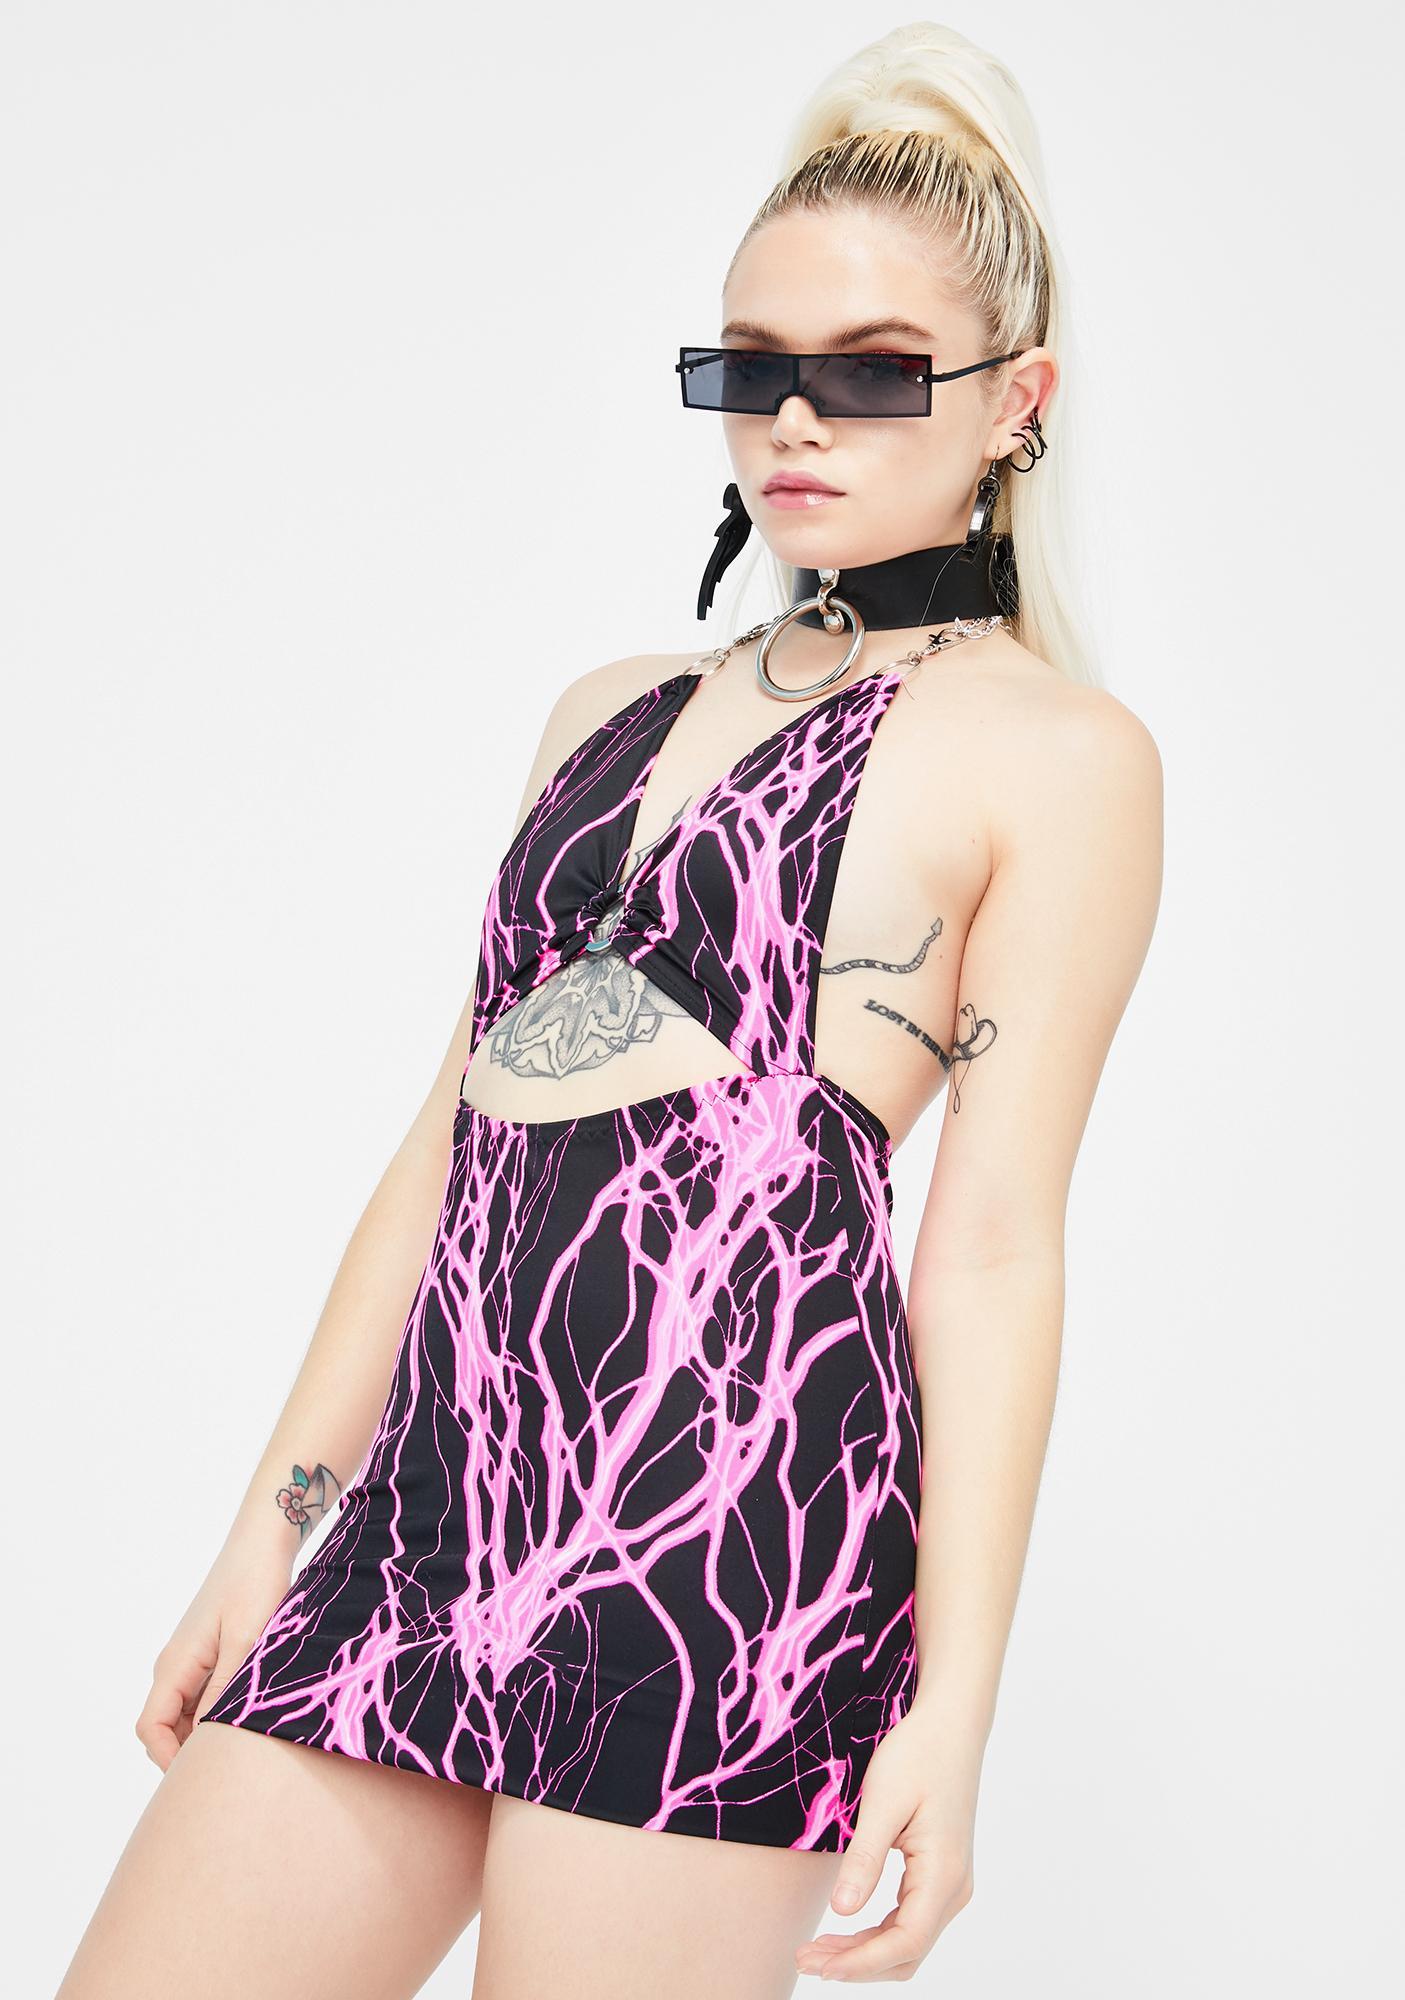 Babydol Clothing Pink Electric Cut-Out Mini Dress